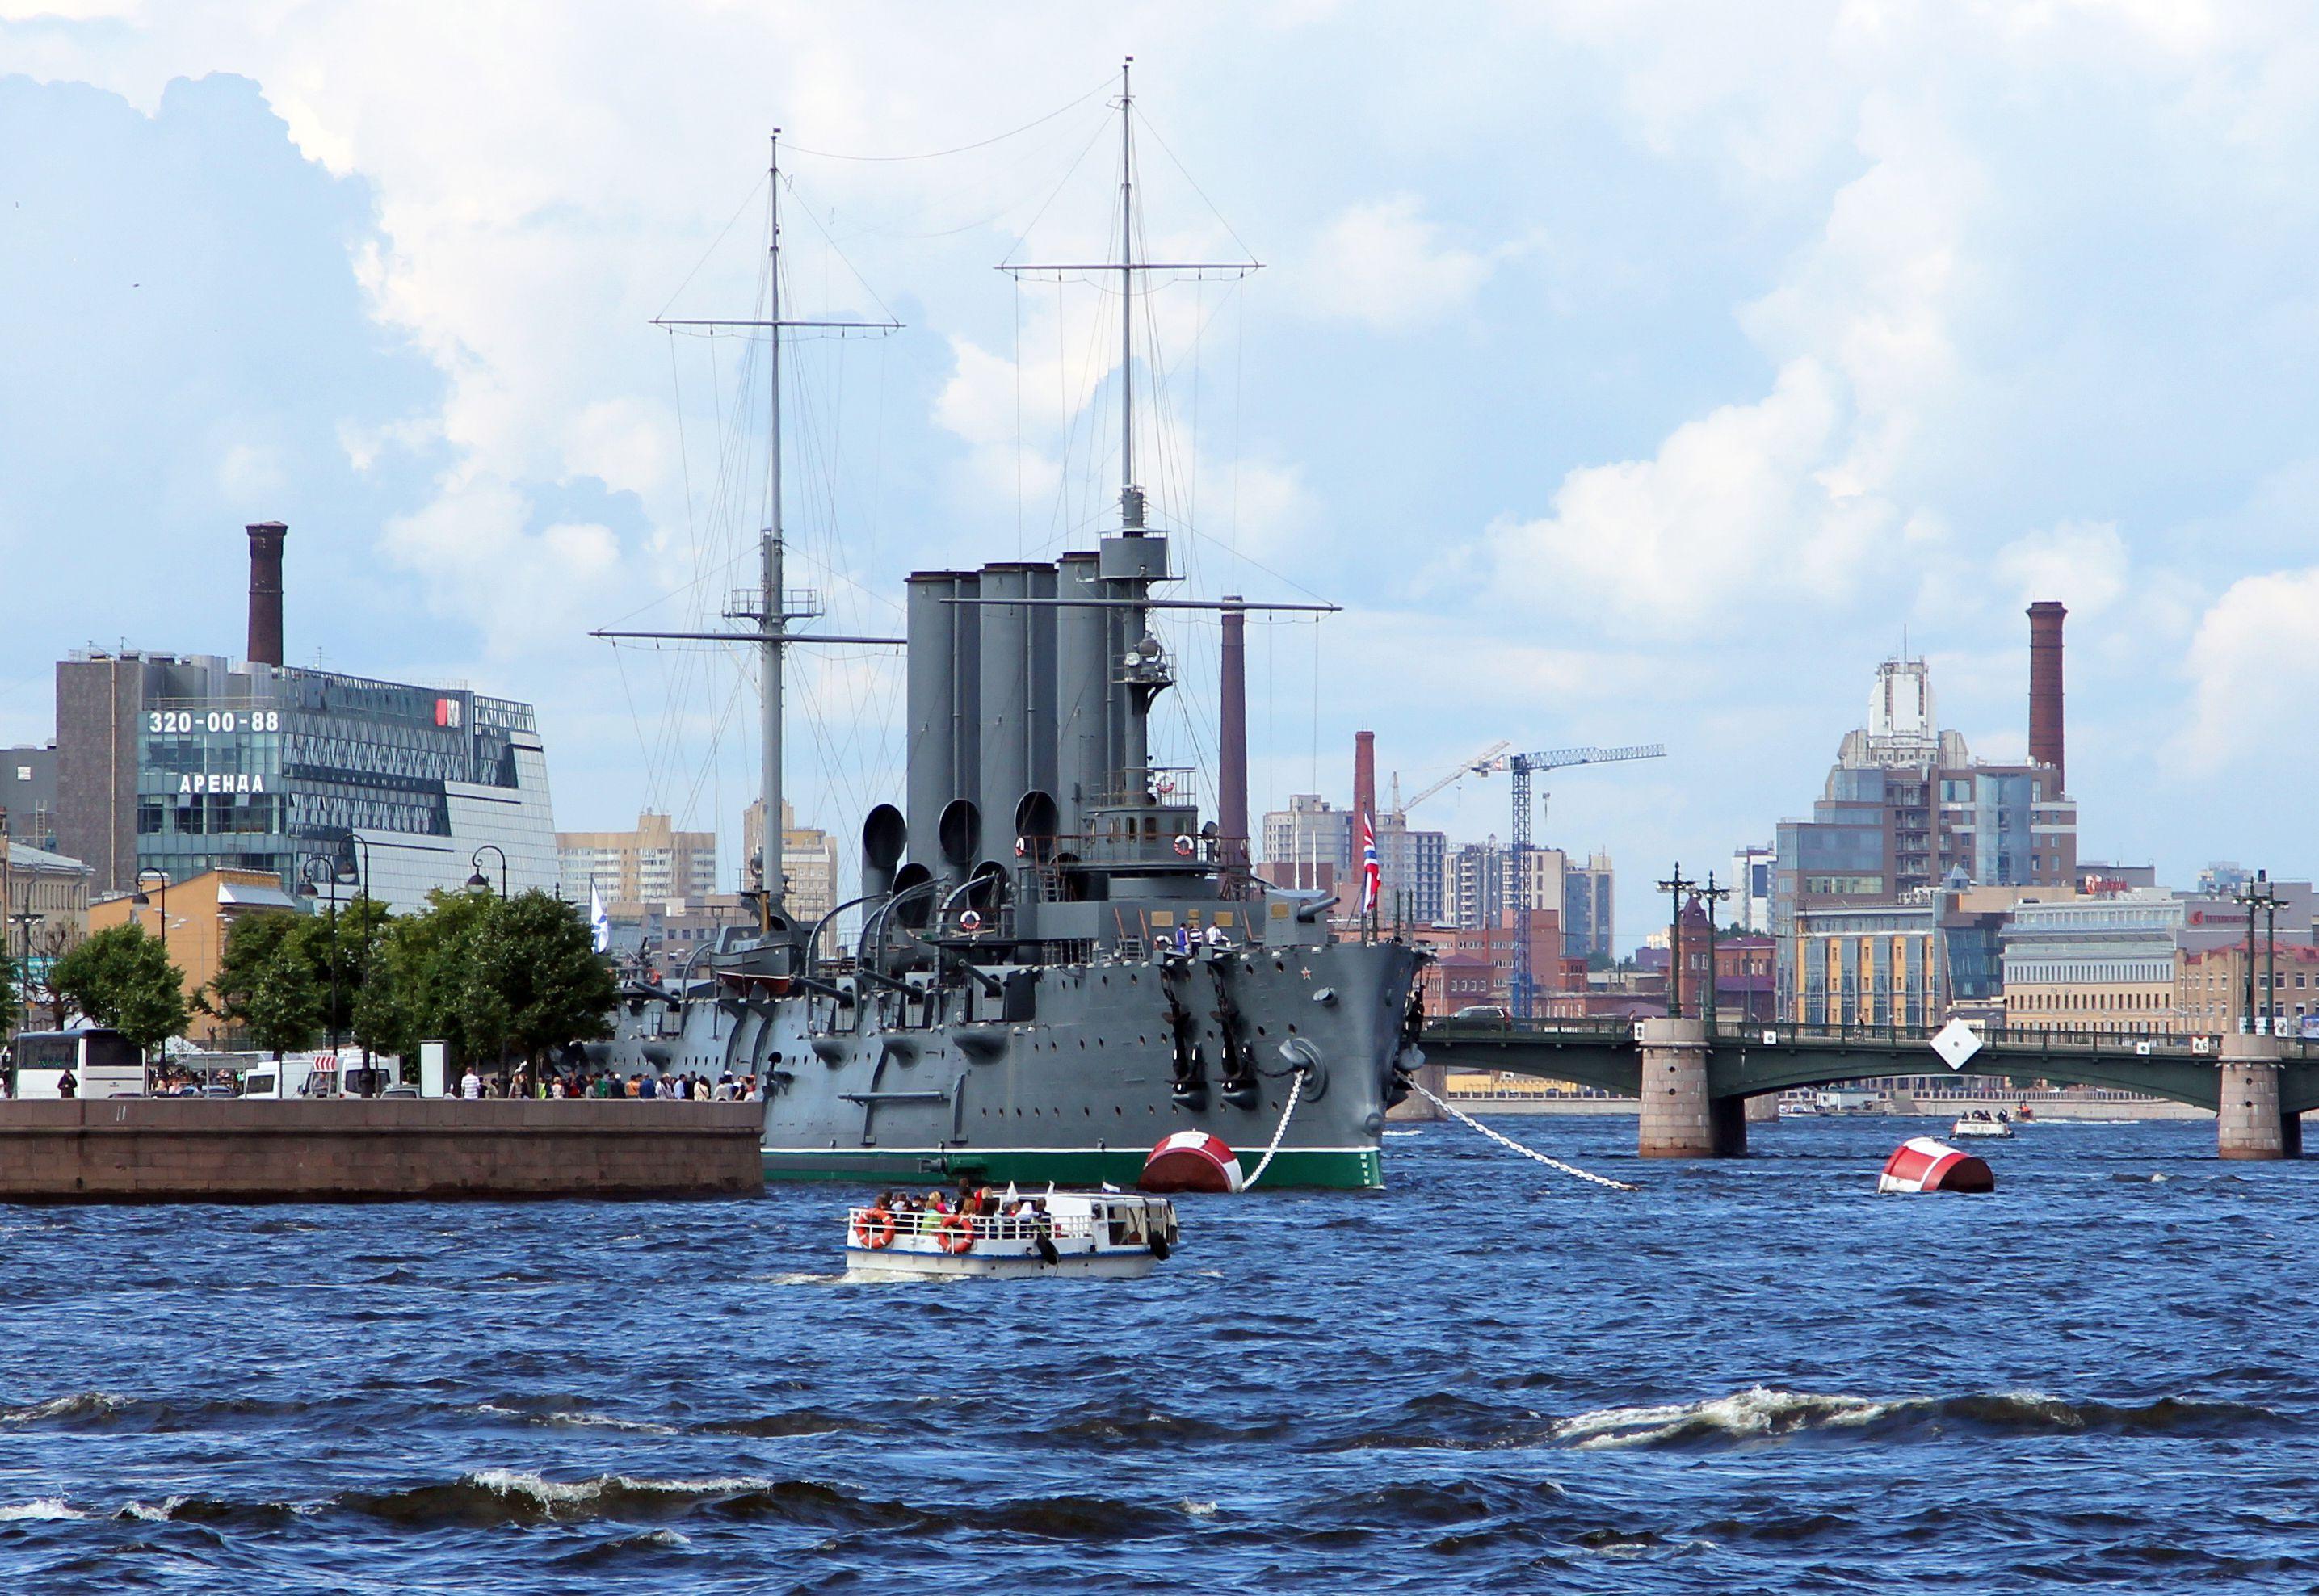 Russian cruiser Aurora on the Neva river